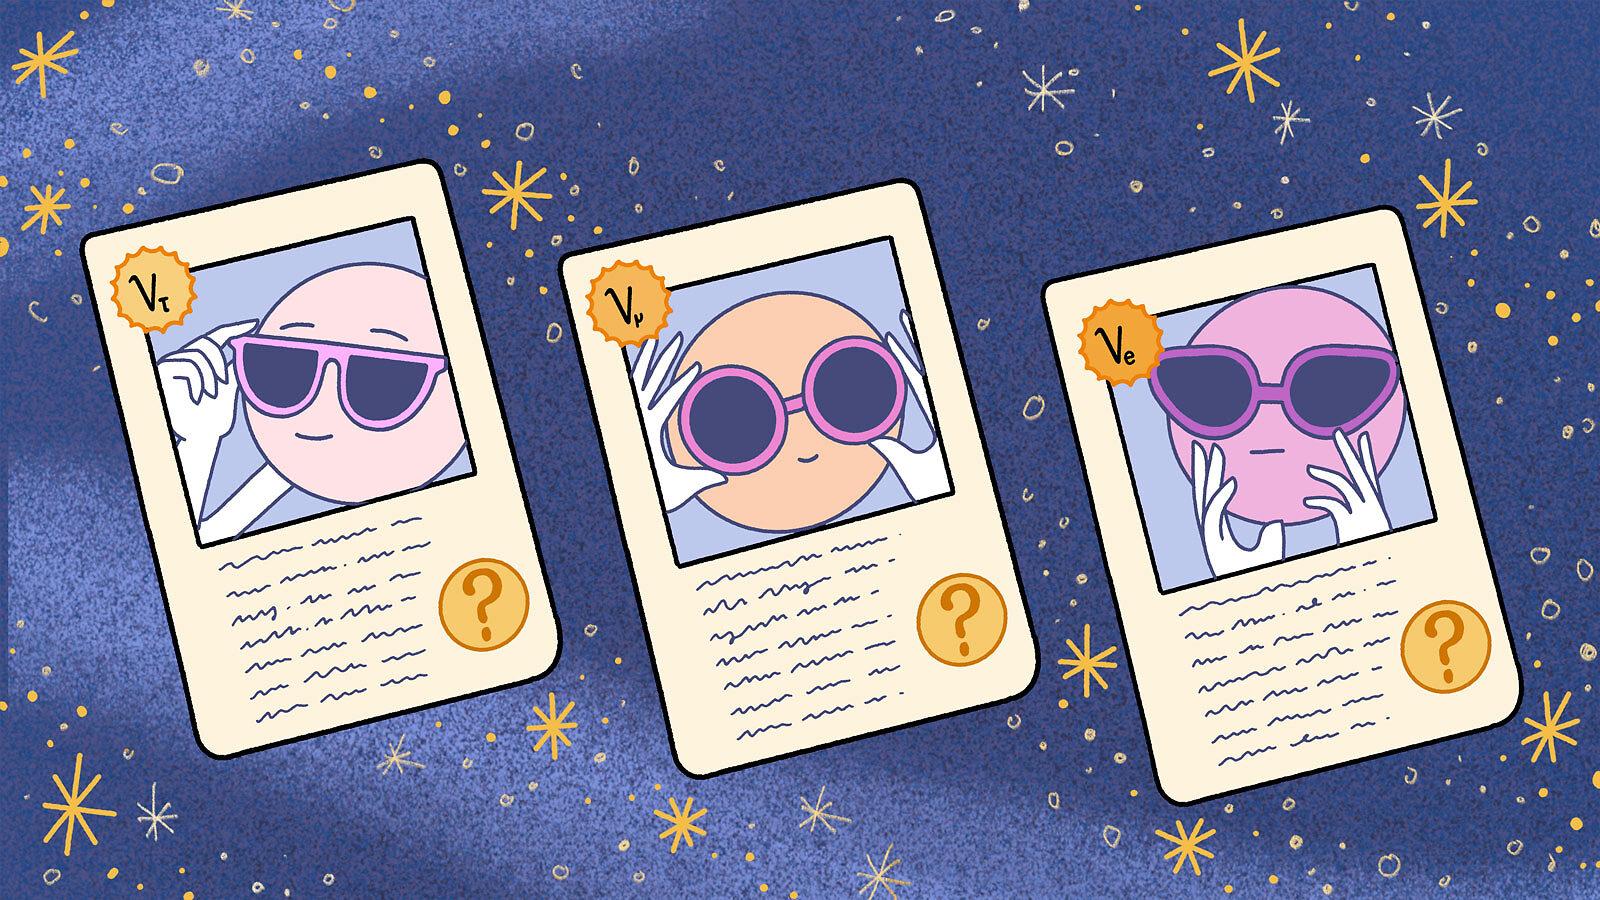 Illustration of neutrino trading cards